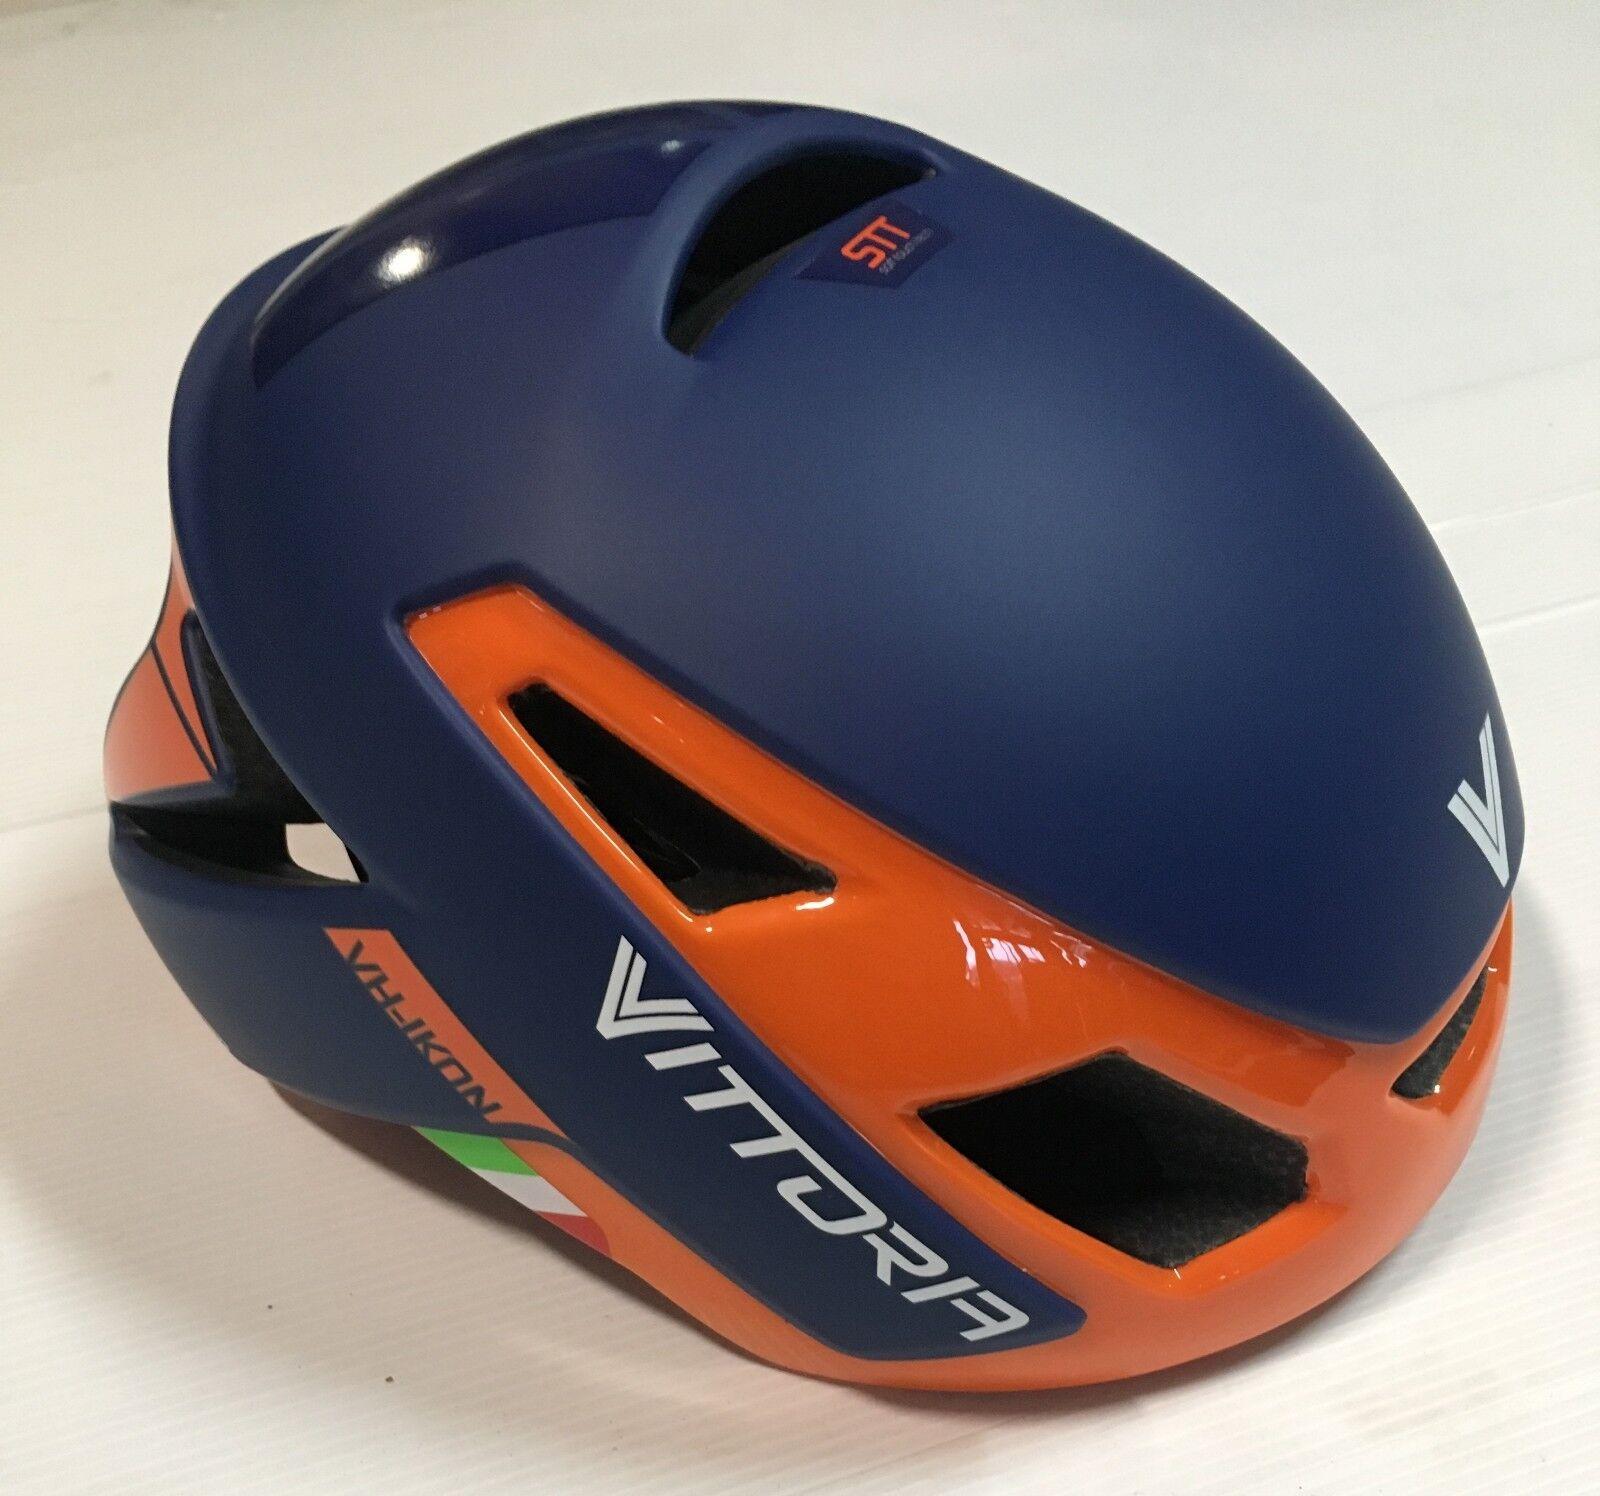 Casco bici corsa Vittoria VH Ikon Arancio  orange road bike helmet L-XL 58-62 cm  your satisfaction is our target